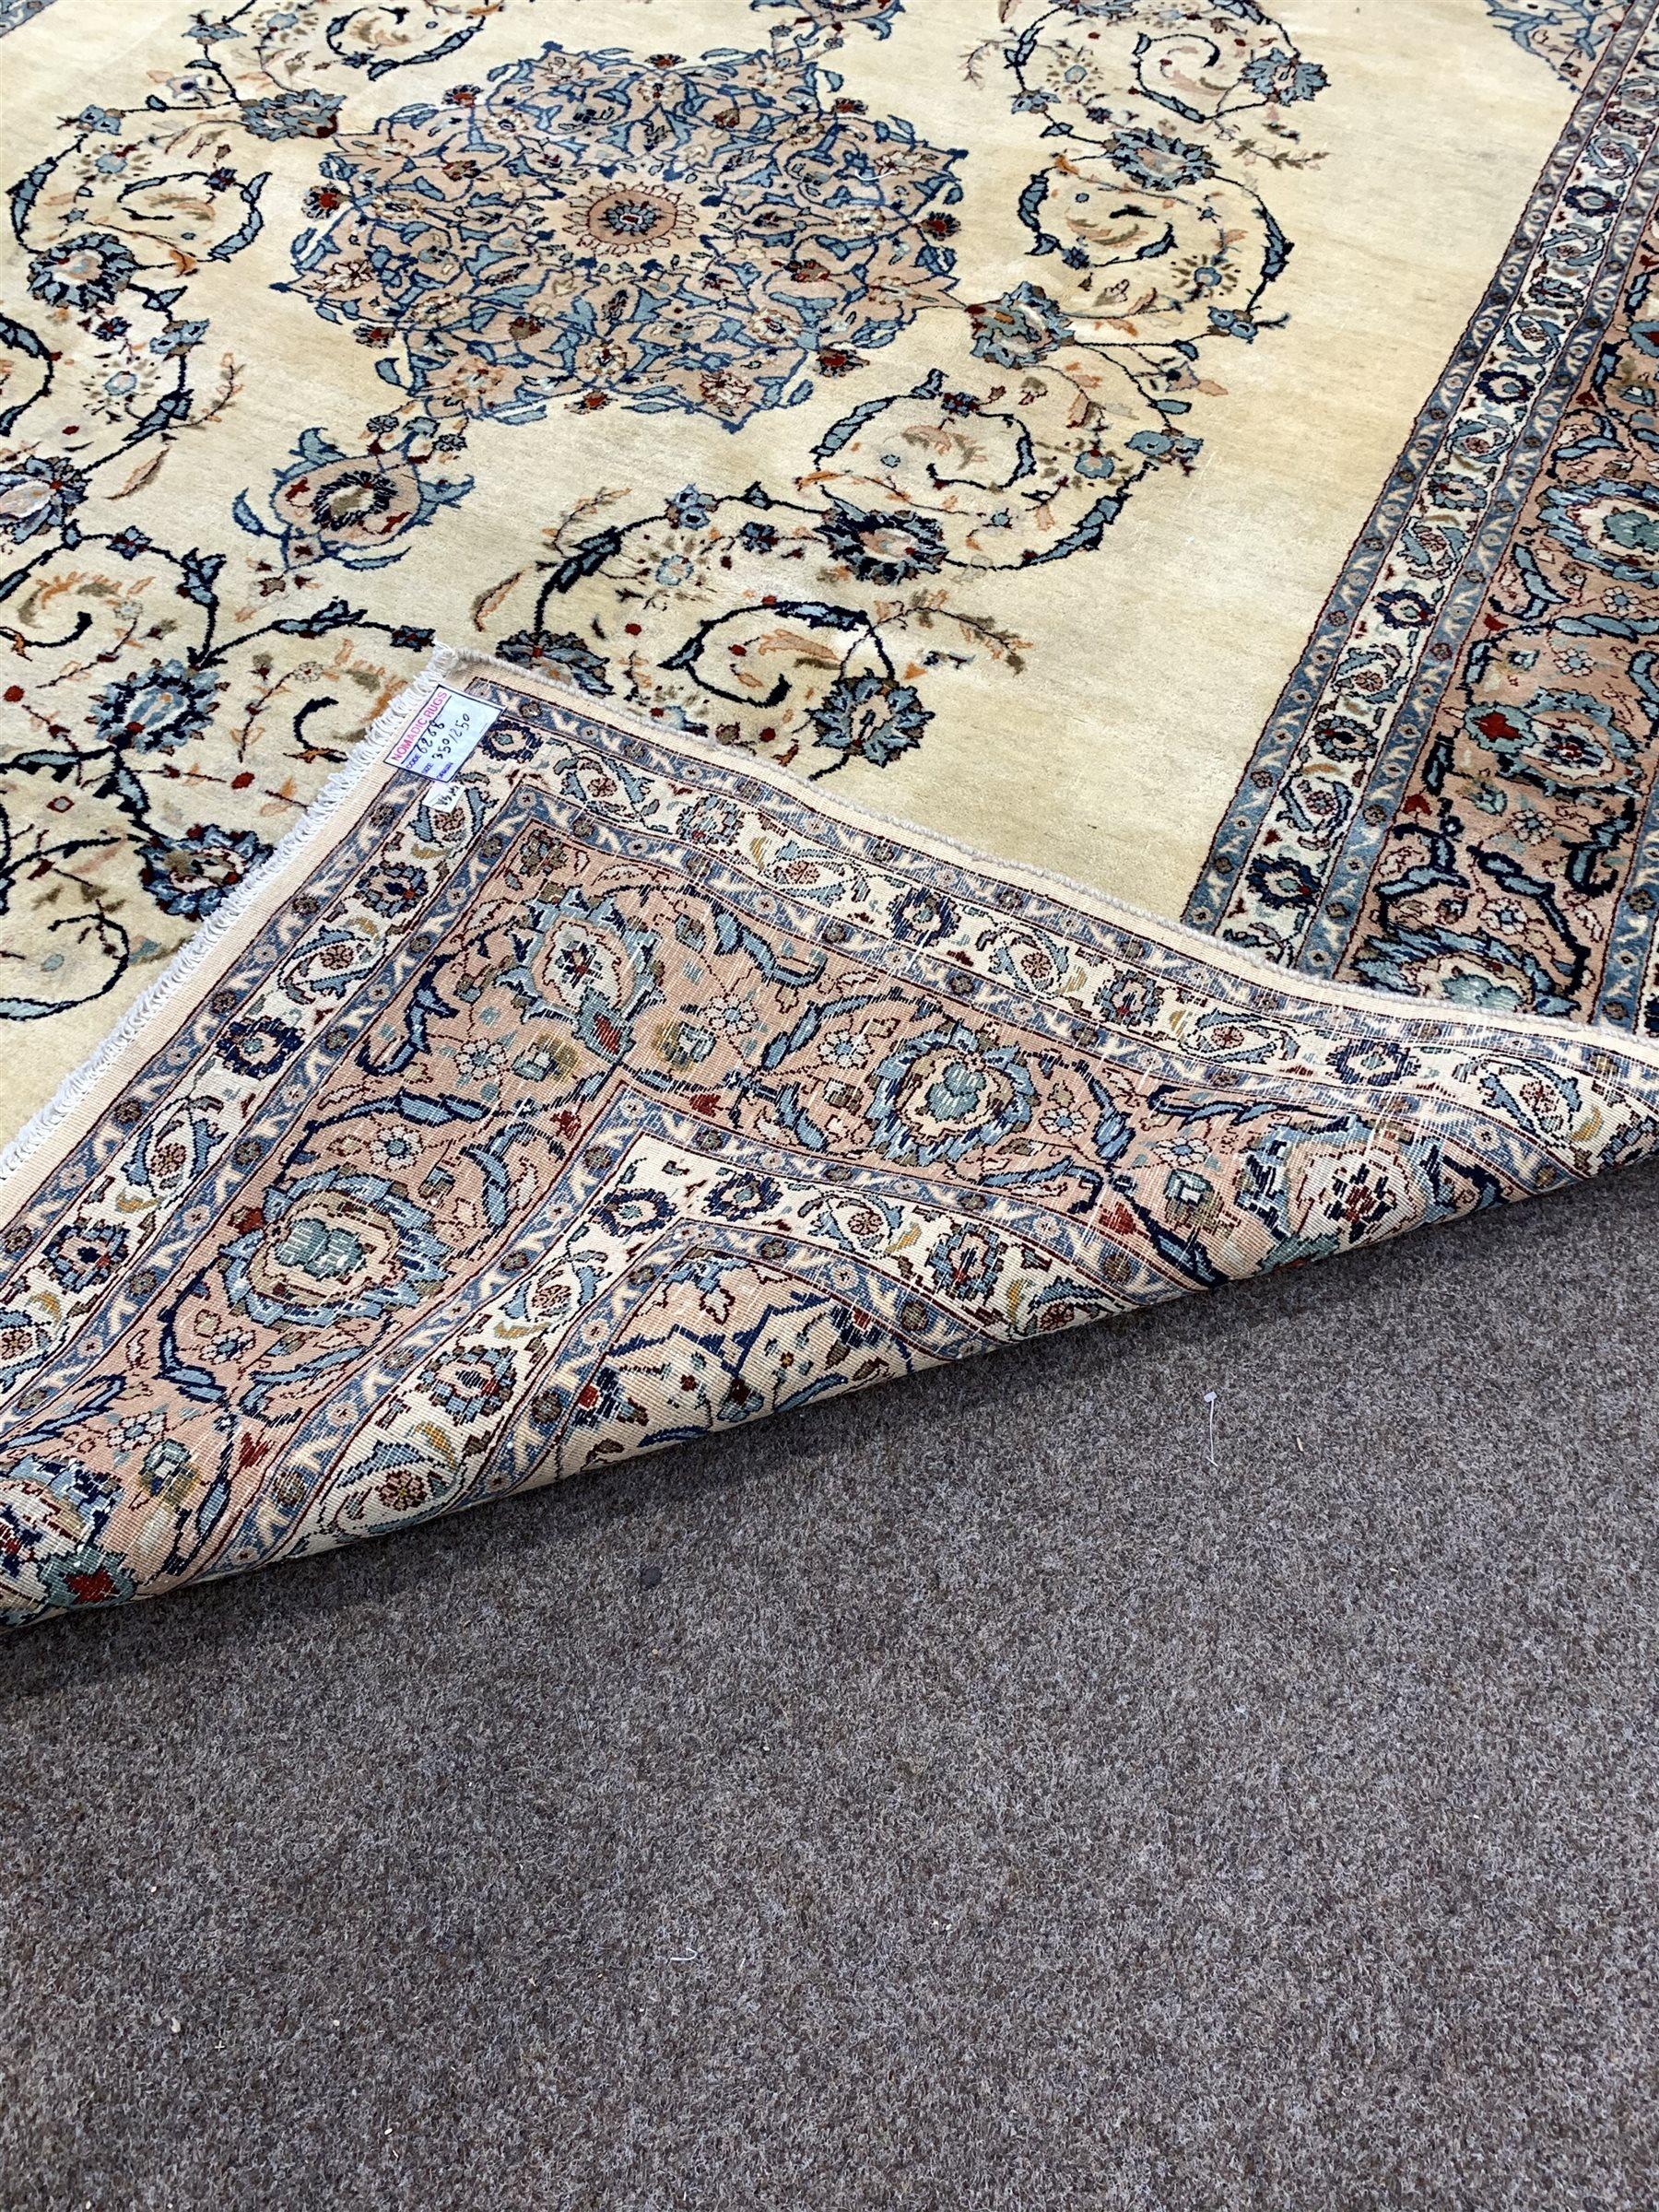 Persian Kashan ground rug - Image 3 of 3